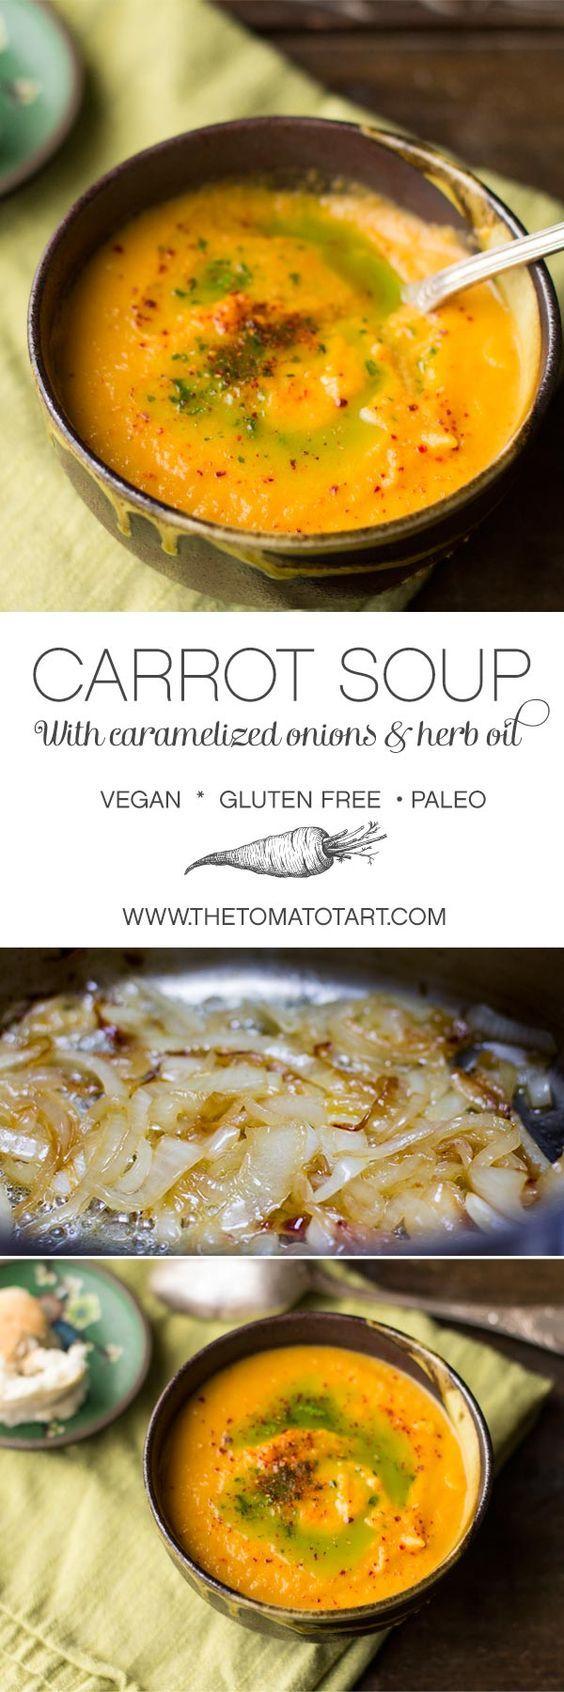 Caramelized Onion & Carrot Soup #vegan #glutenfree #paleo - maybe use cauliflower instead of potatoes